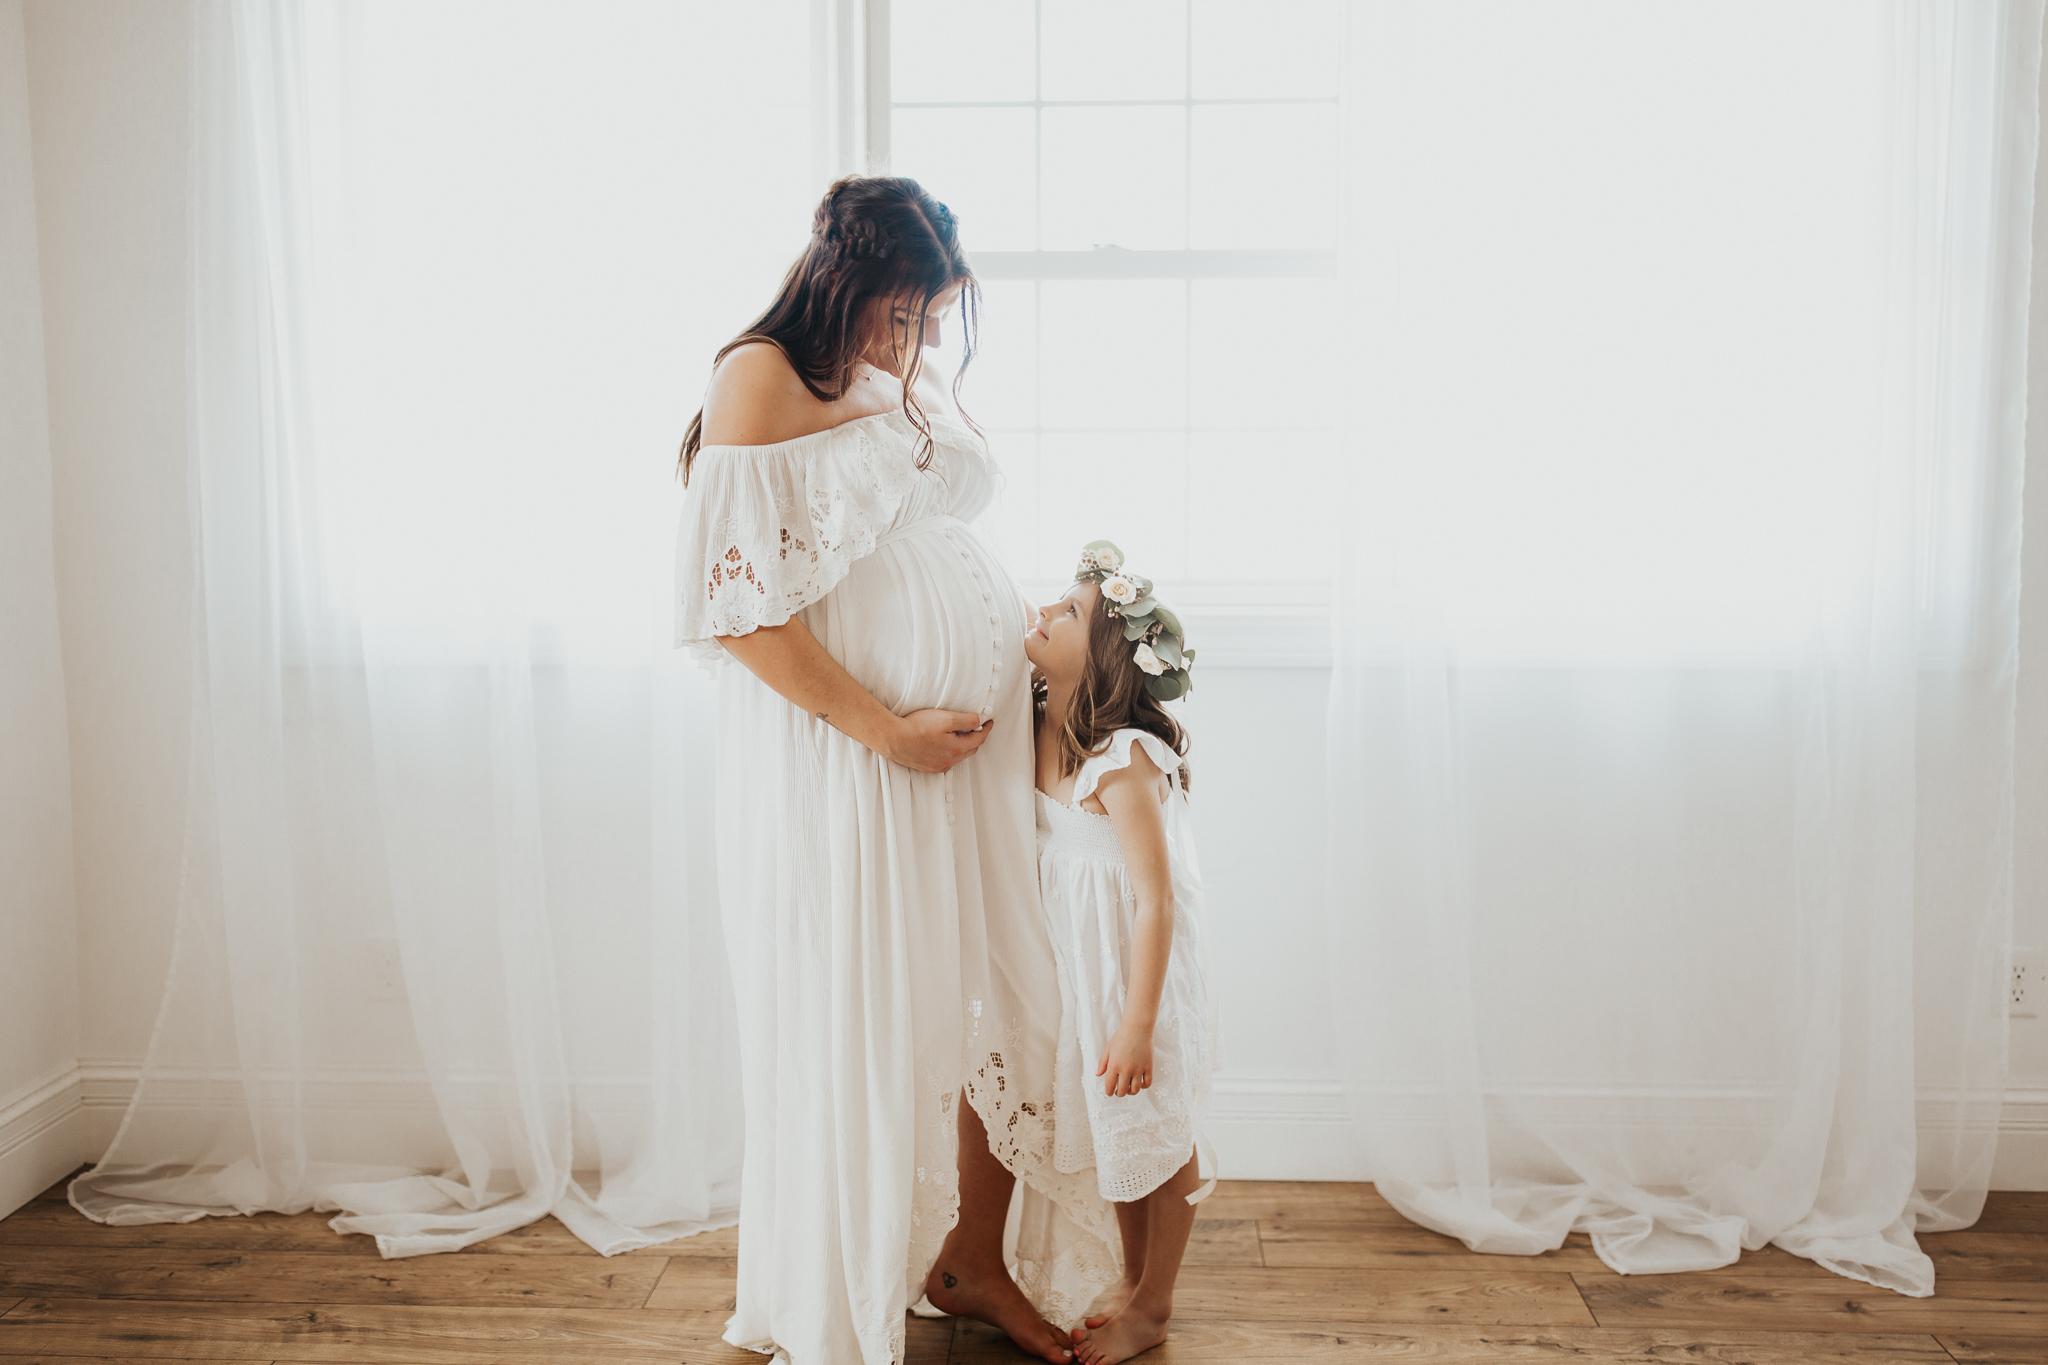 Hines_Maternity-4.jpg